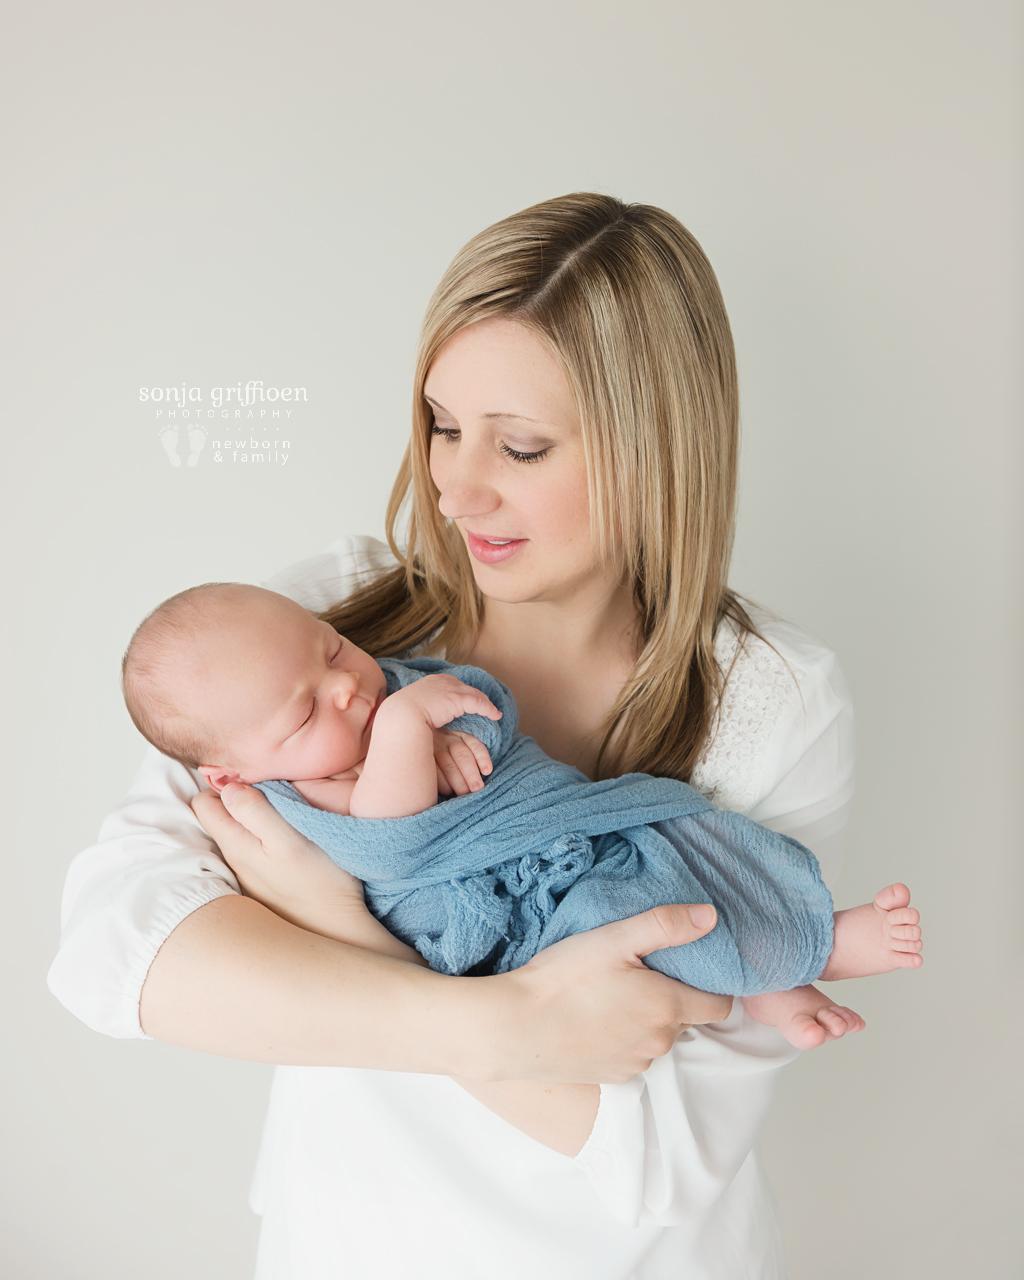 Joshua-Newborn-Brisbane-Newborn-Photographer-Sonja-Griffioen-12.jpg